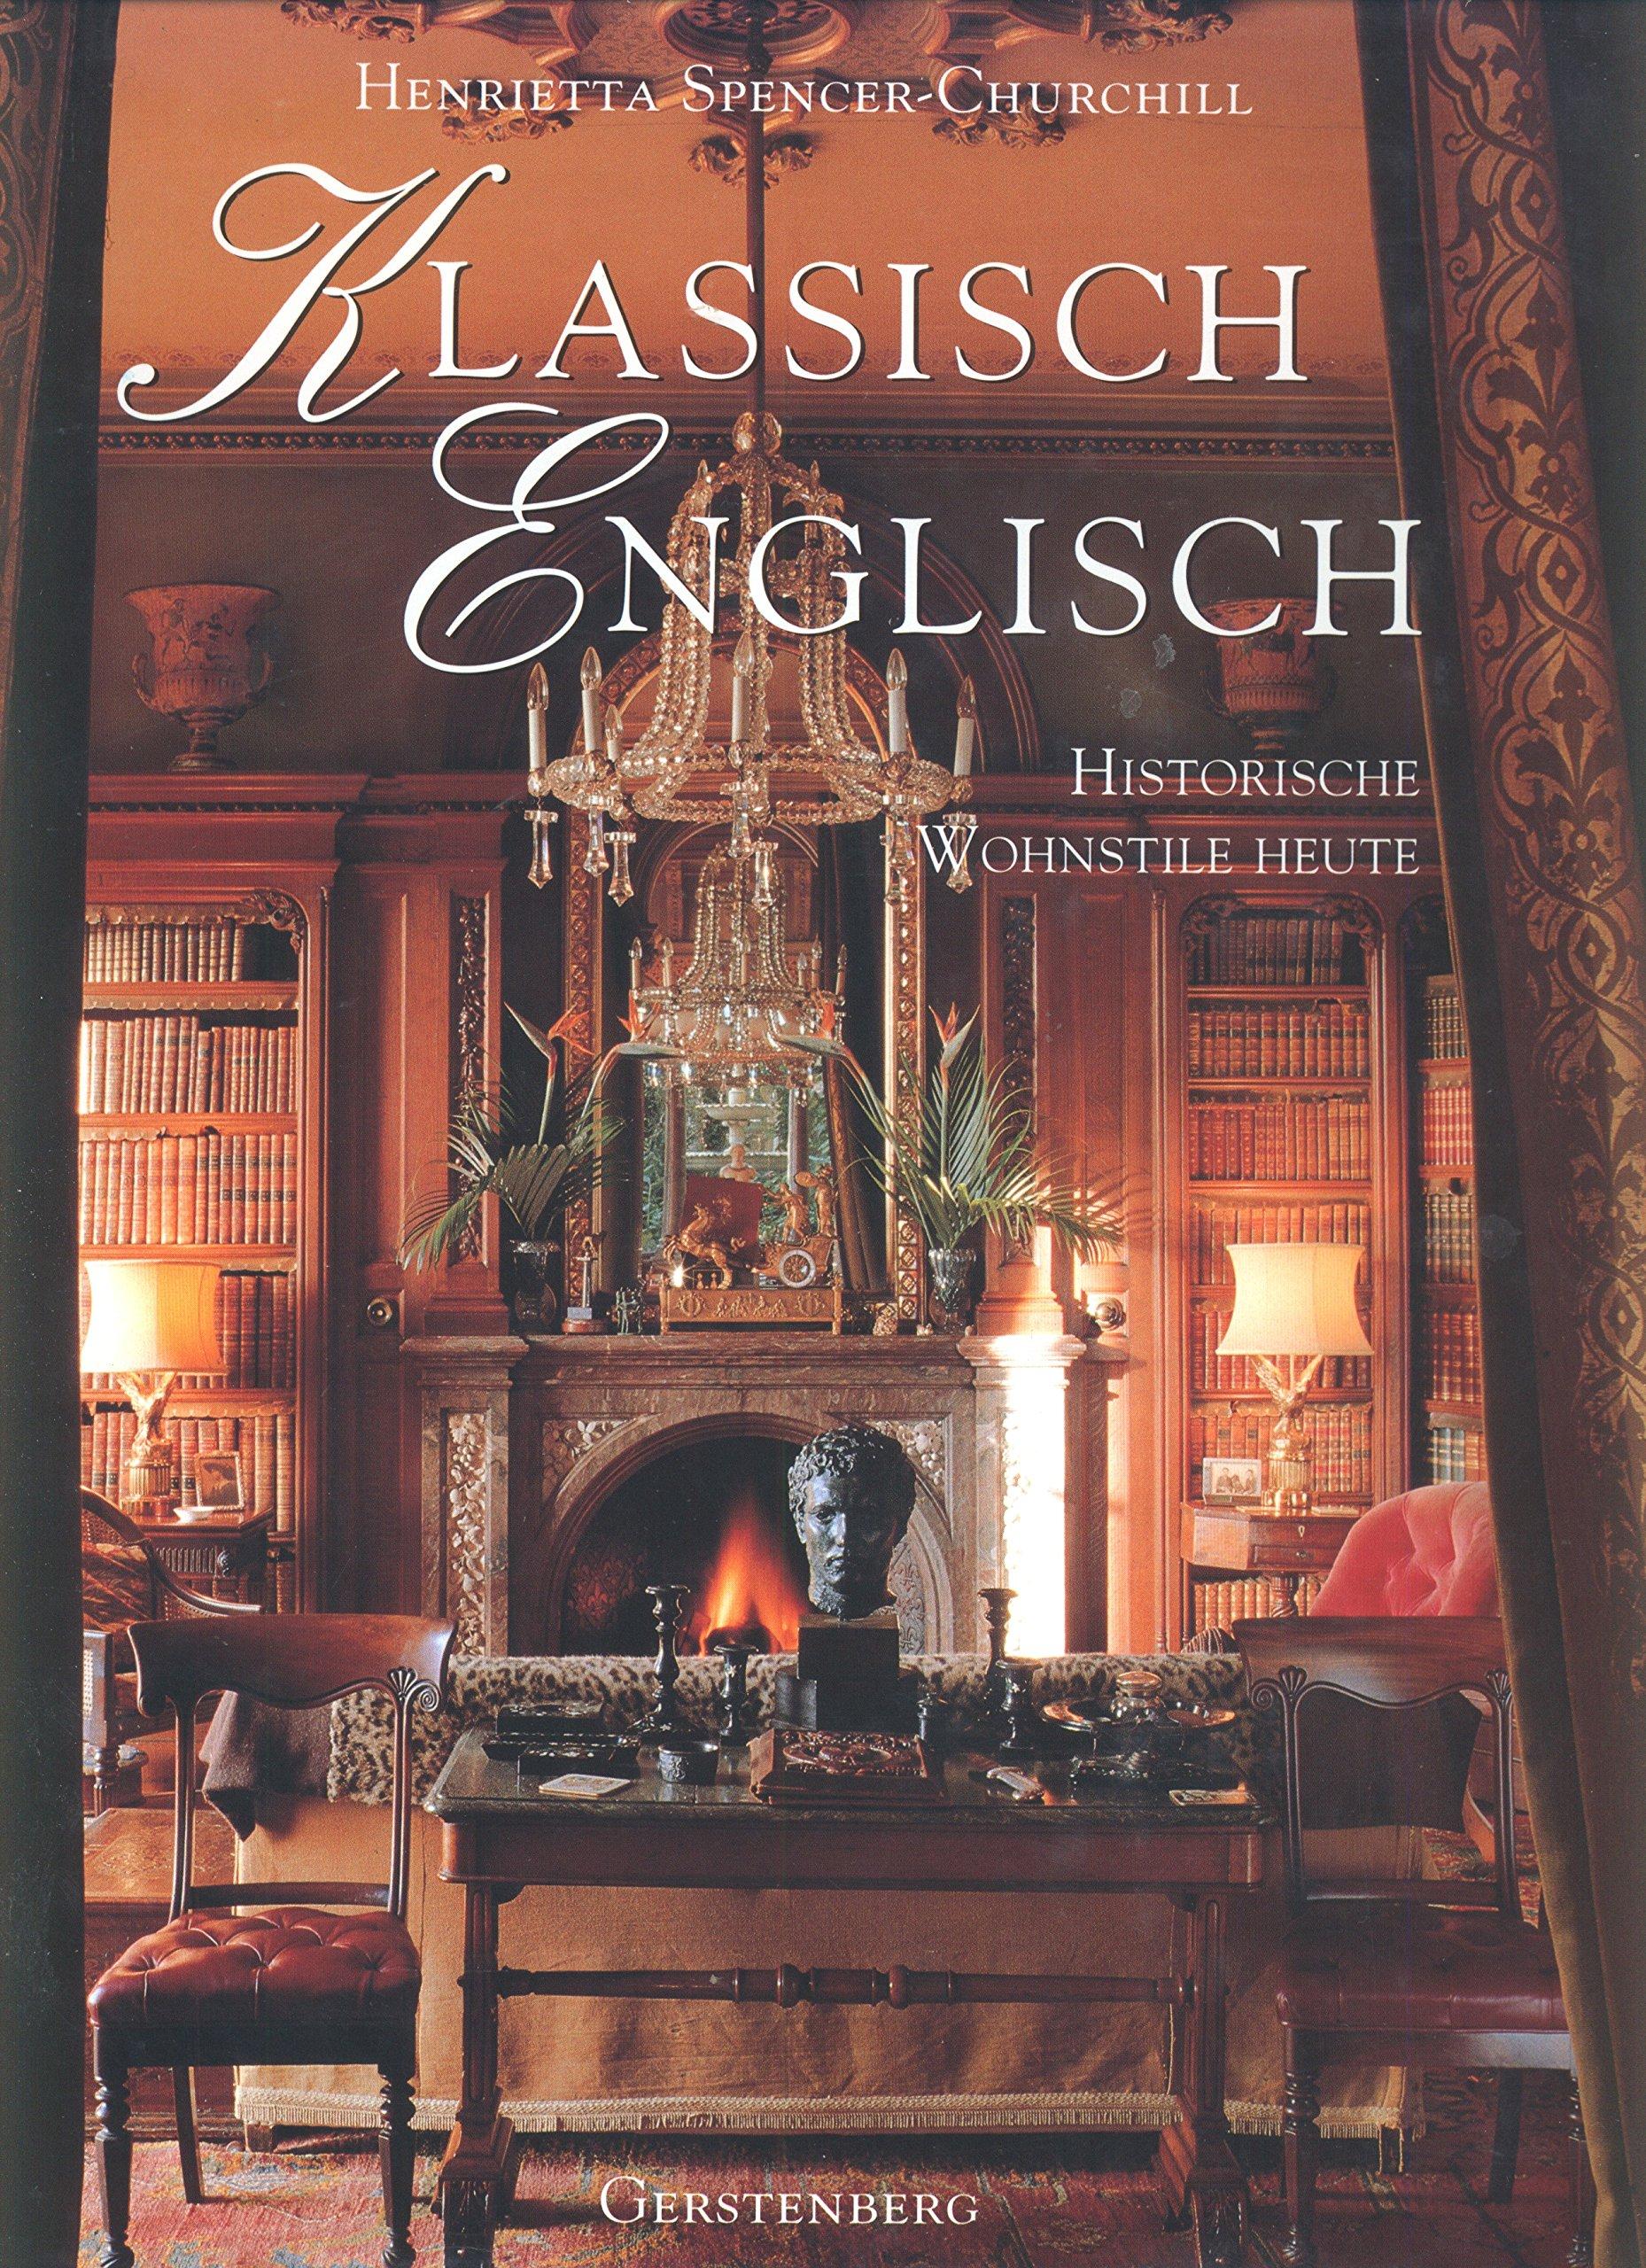 Klassisch englisch  Spencer Churchill, Henrietta, Wood, Andrew ...